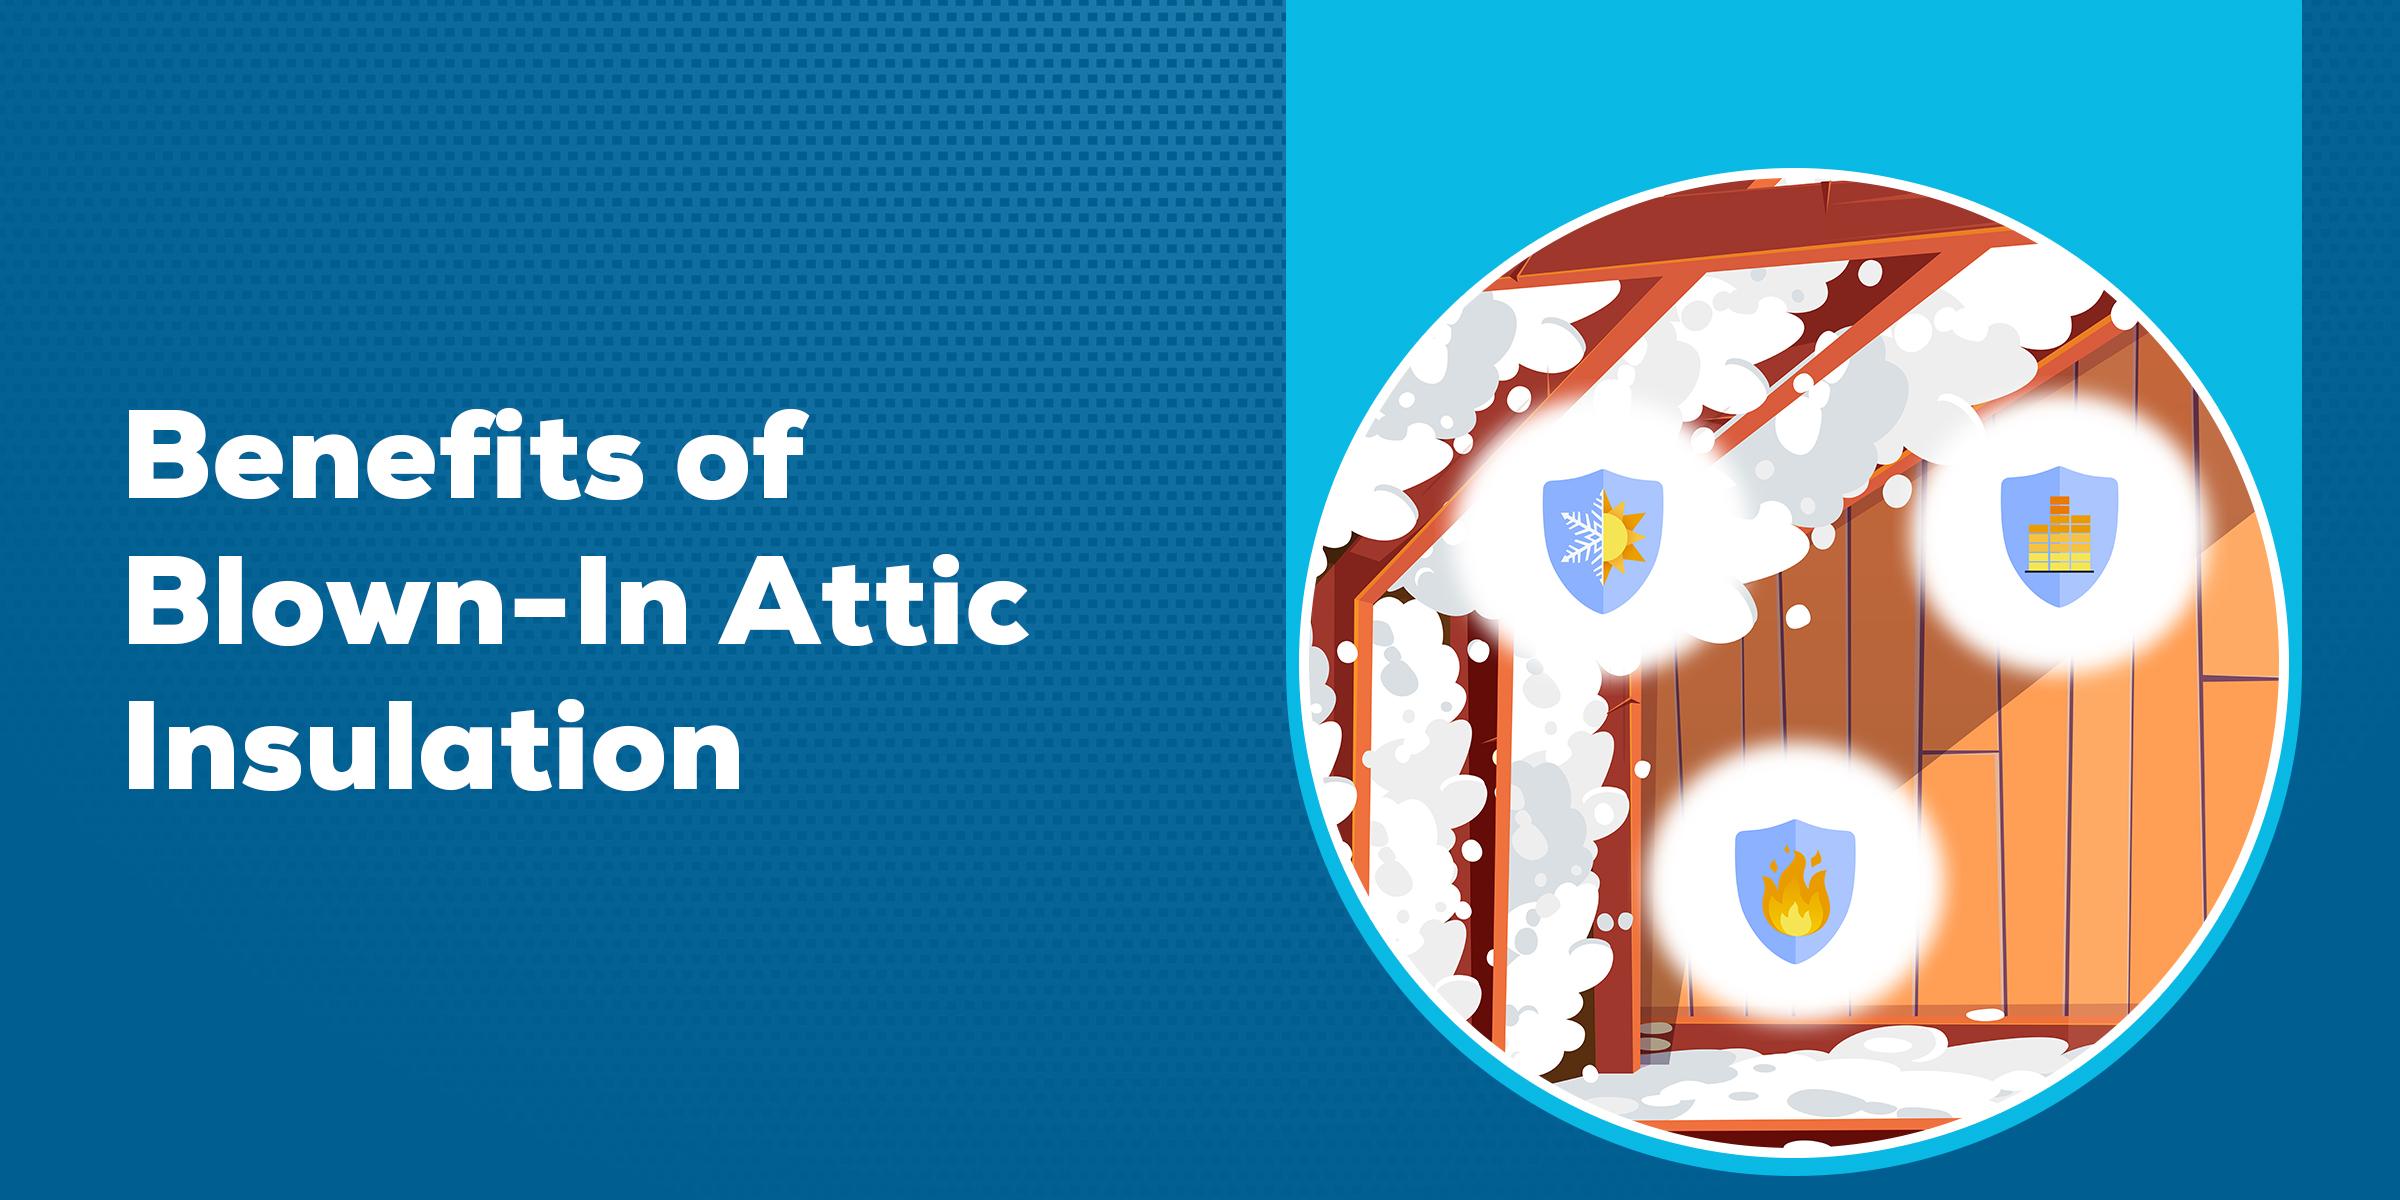 Benefits of Blown In Attic Insulation